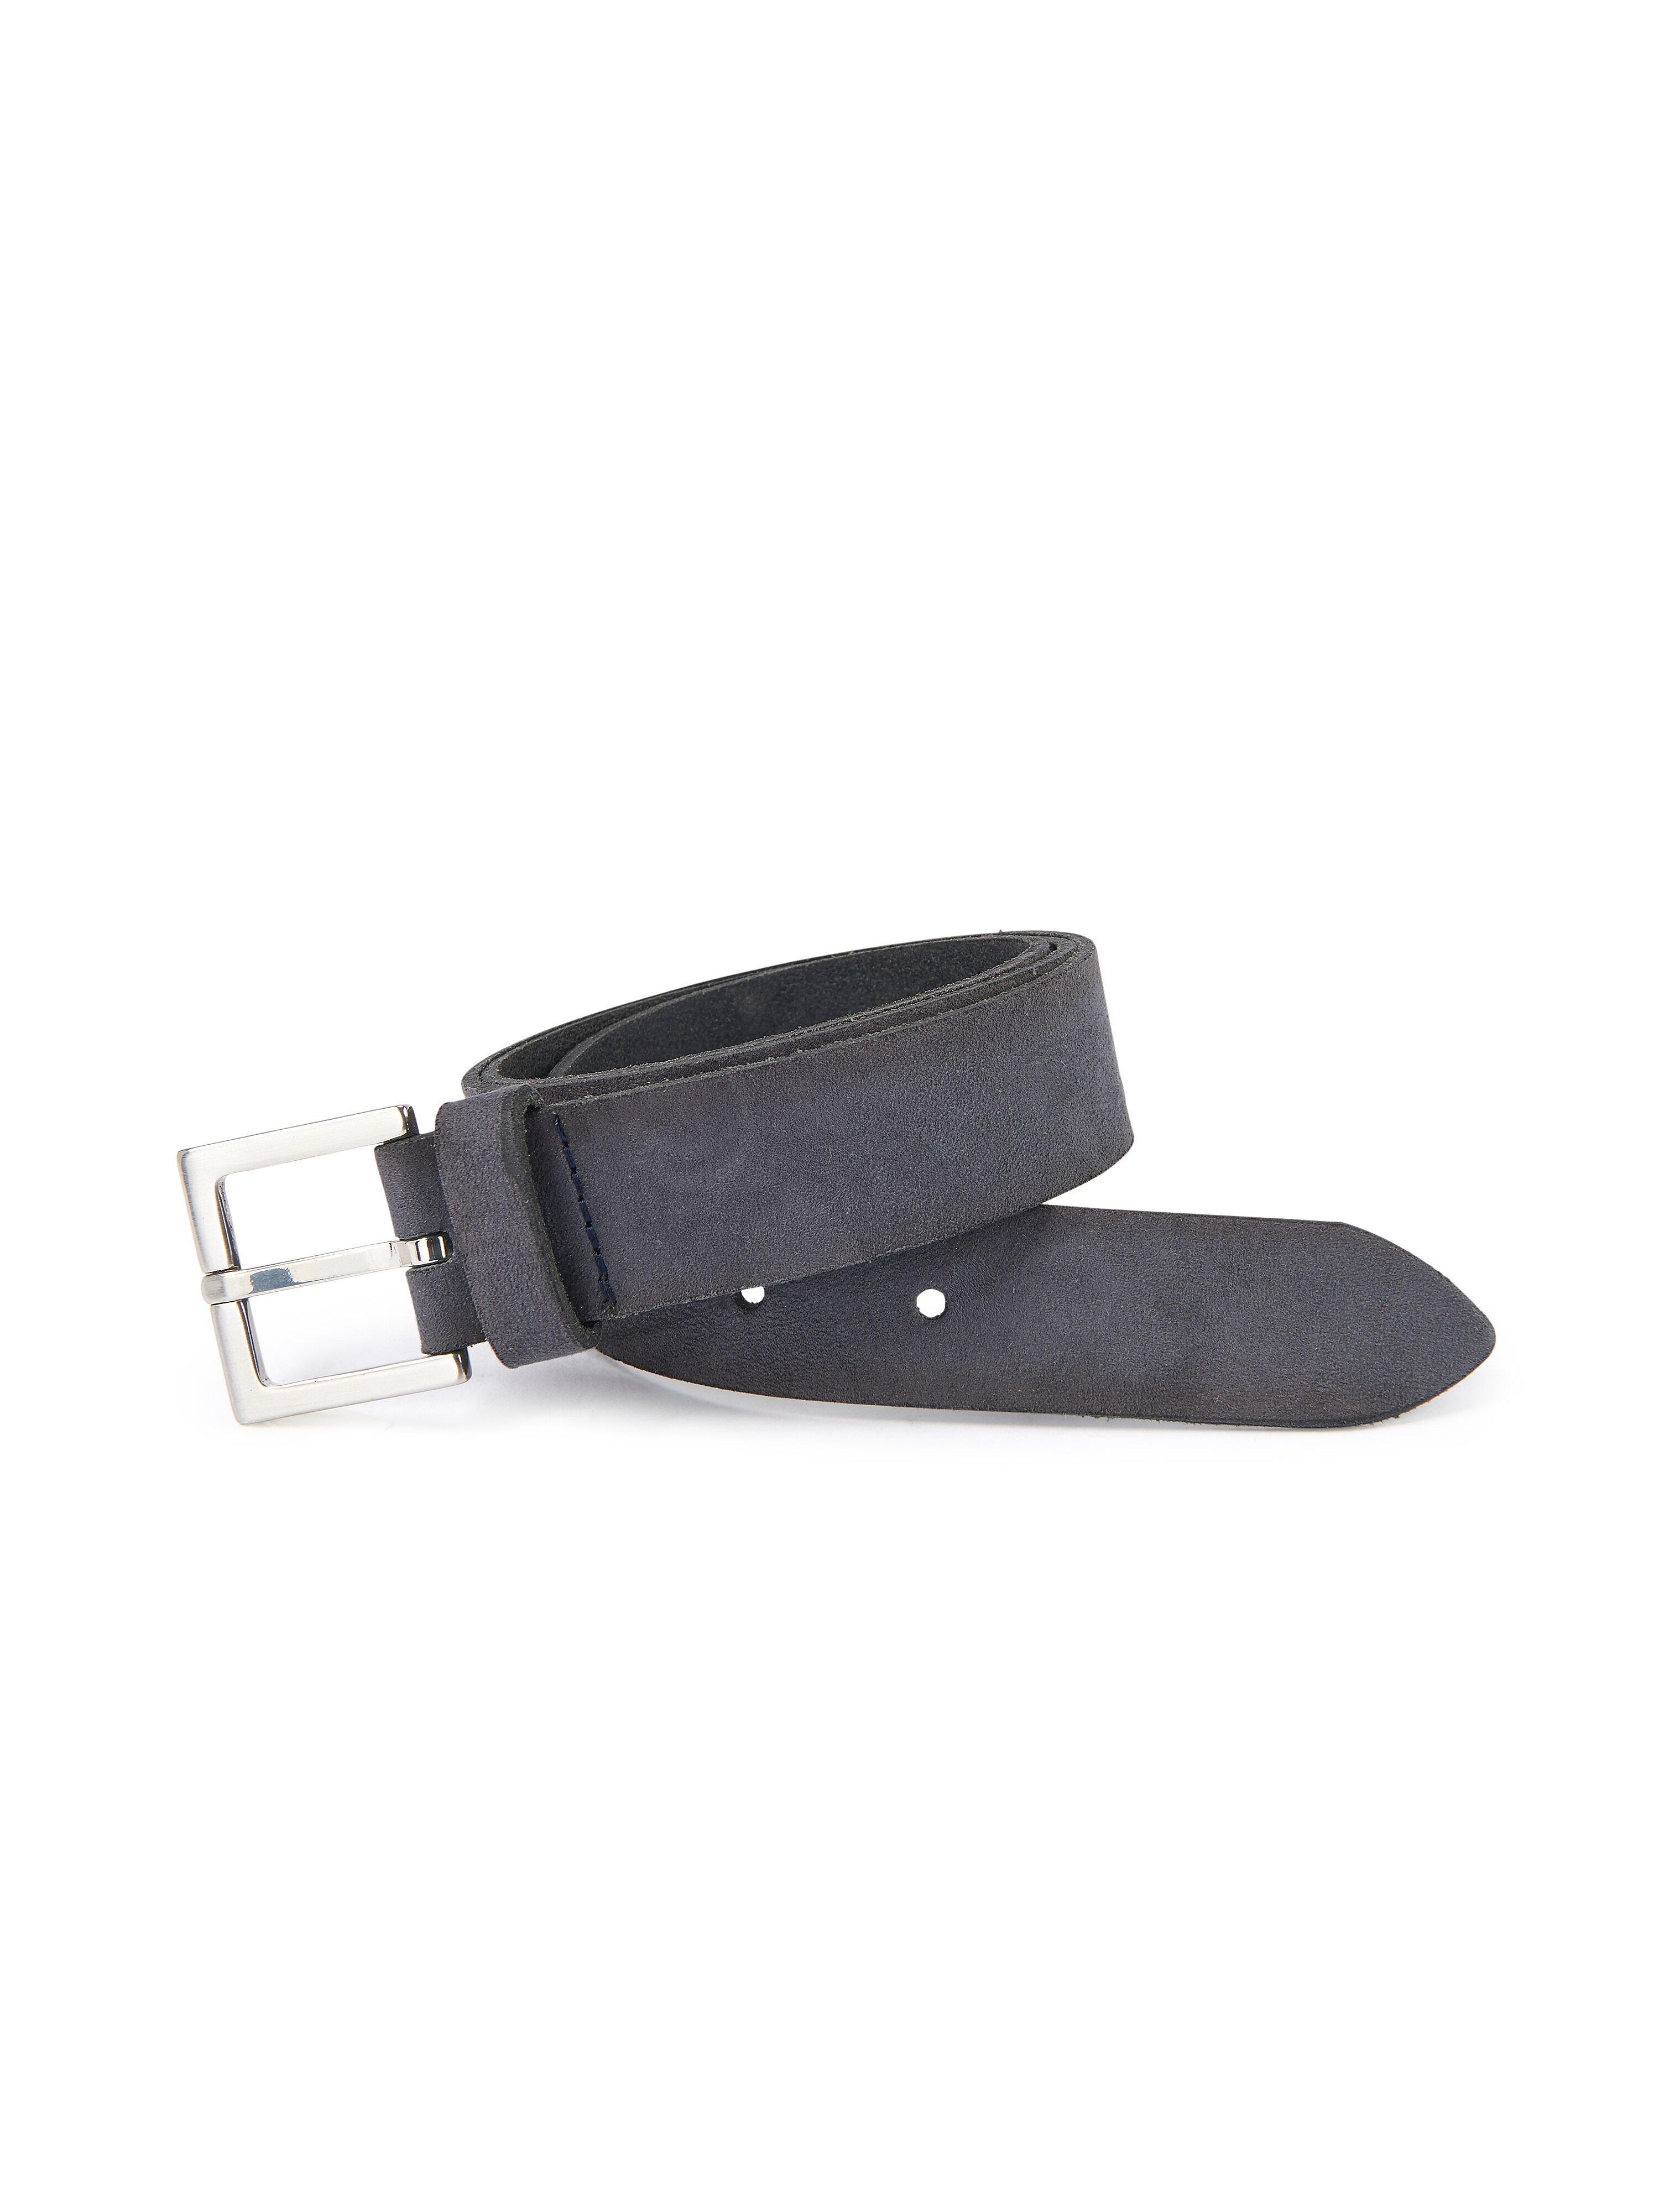 La ceinture  DAY.LIKE bleu taille 95